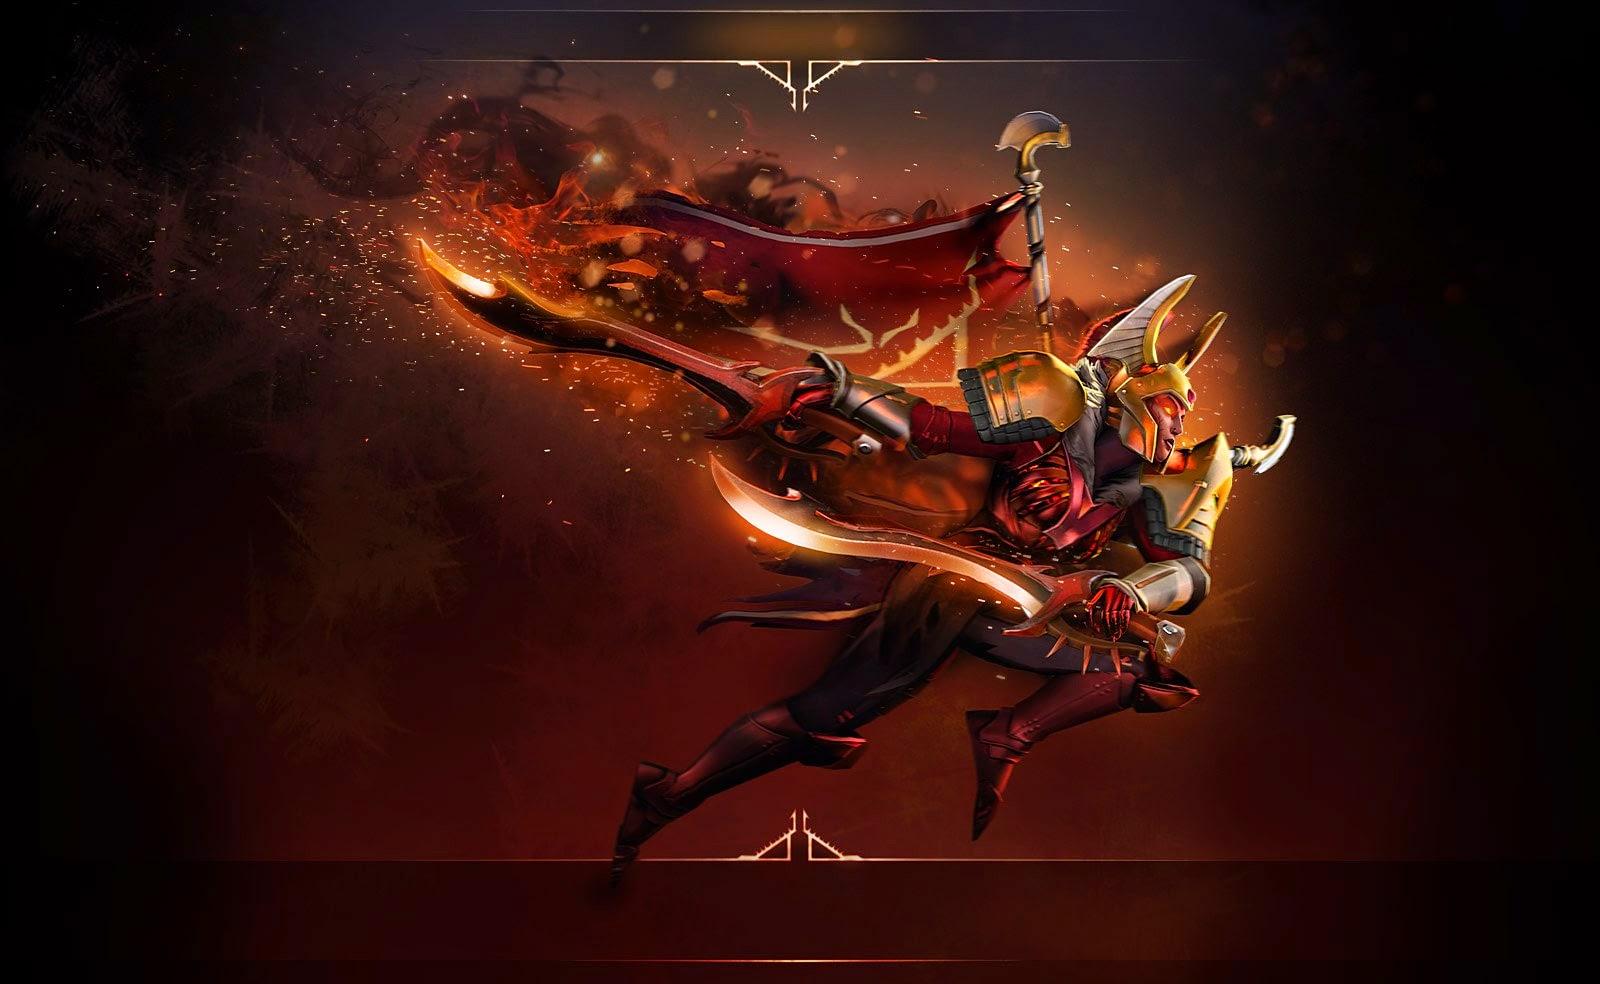 Dota 2 Arcana: Legion Commander Arcana - Blades Of Voth